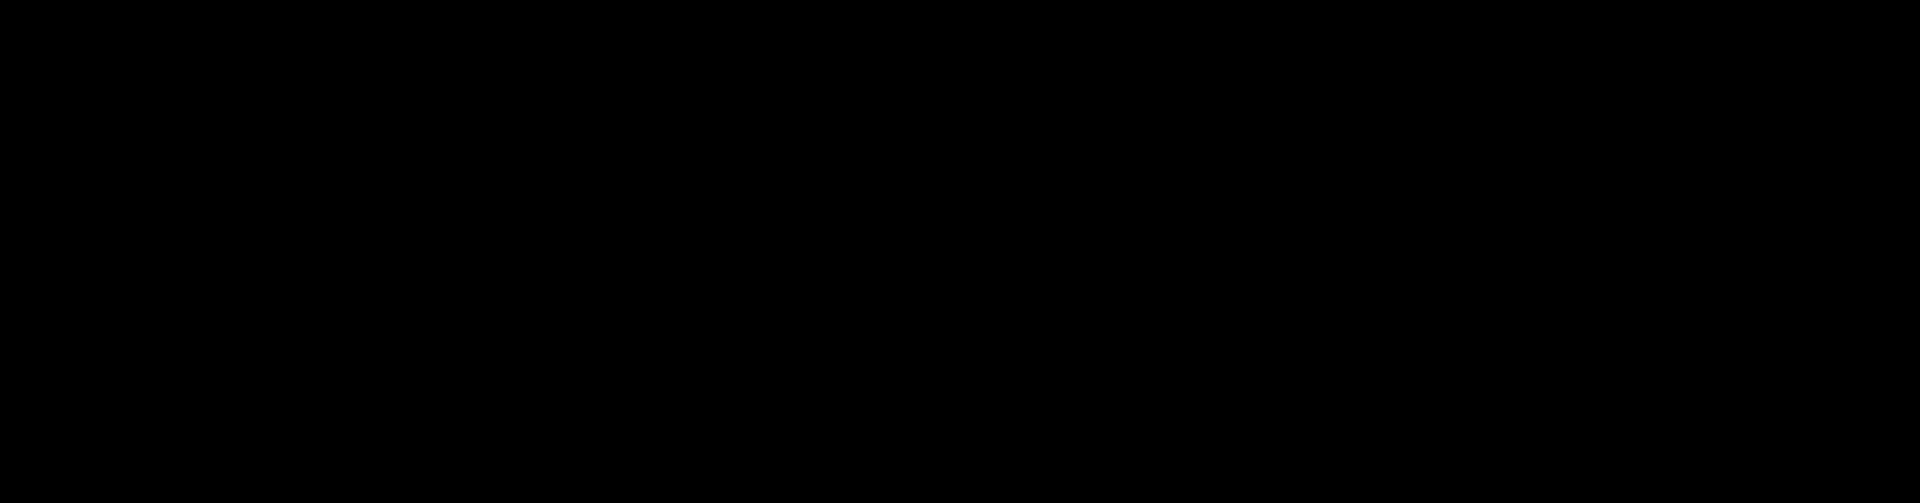 VSight_logo_black